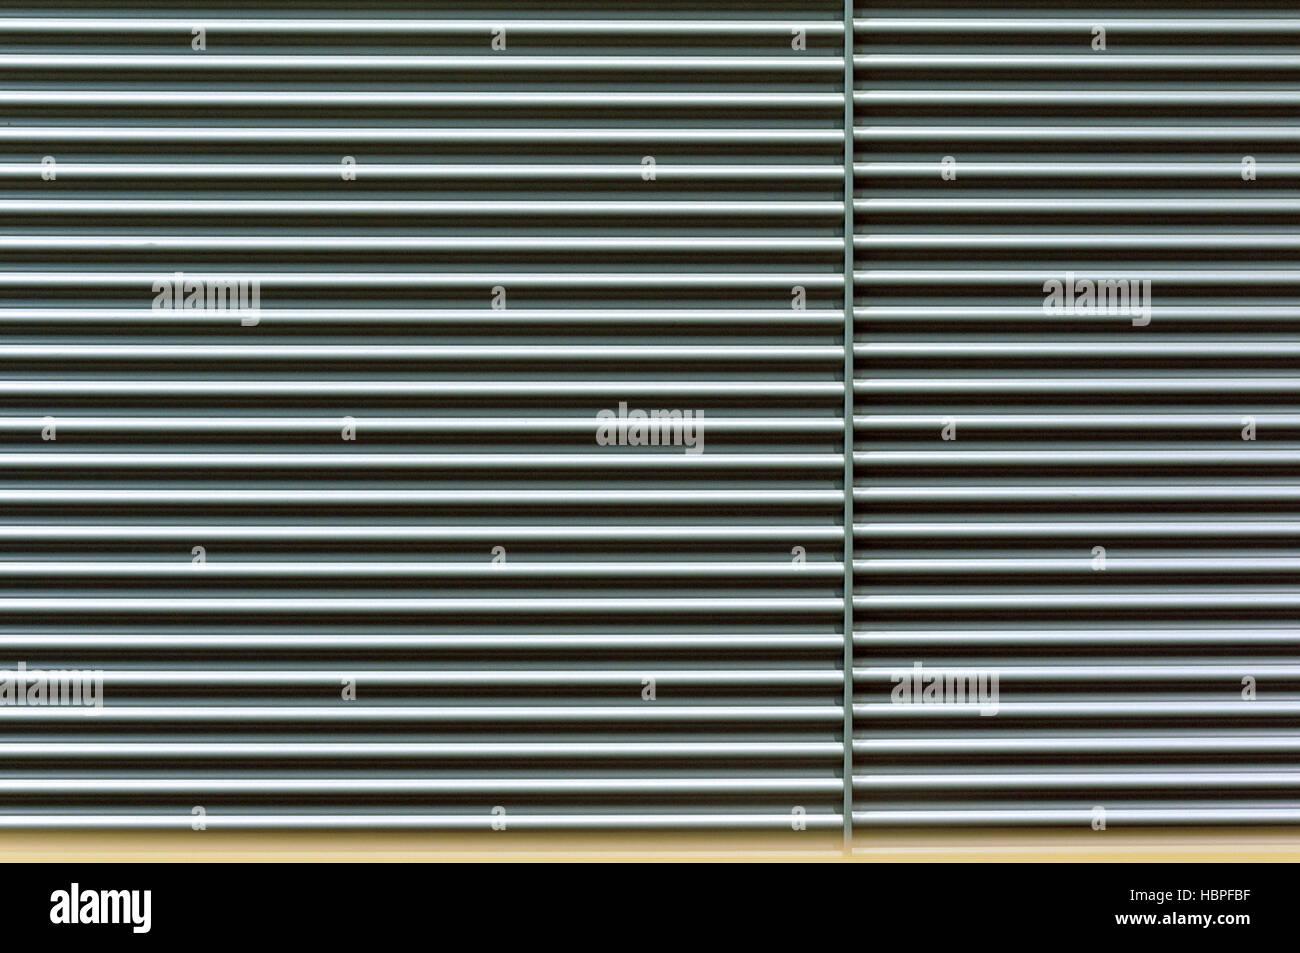 metallic roll curtain - Stock Image